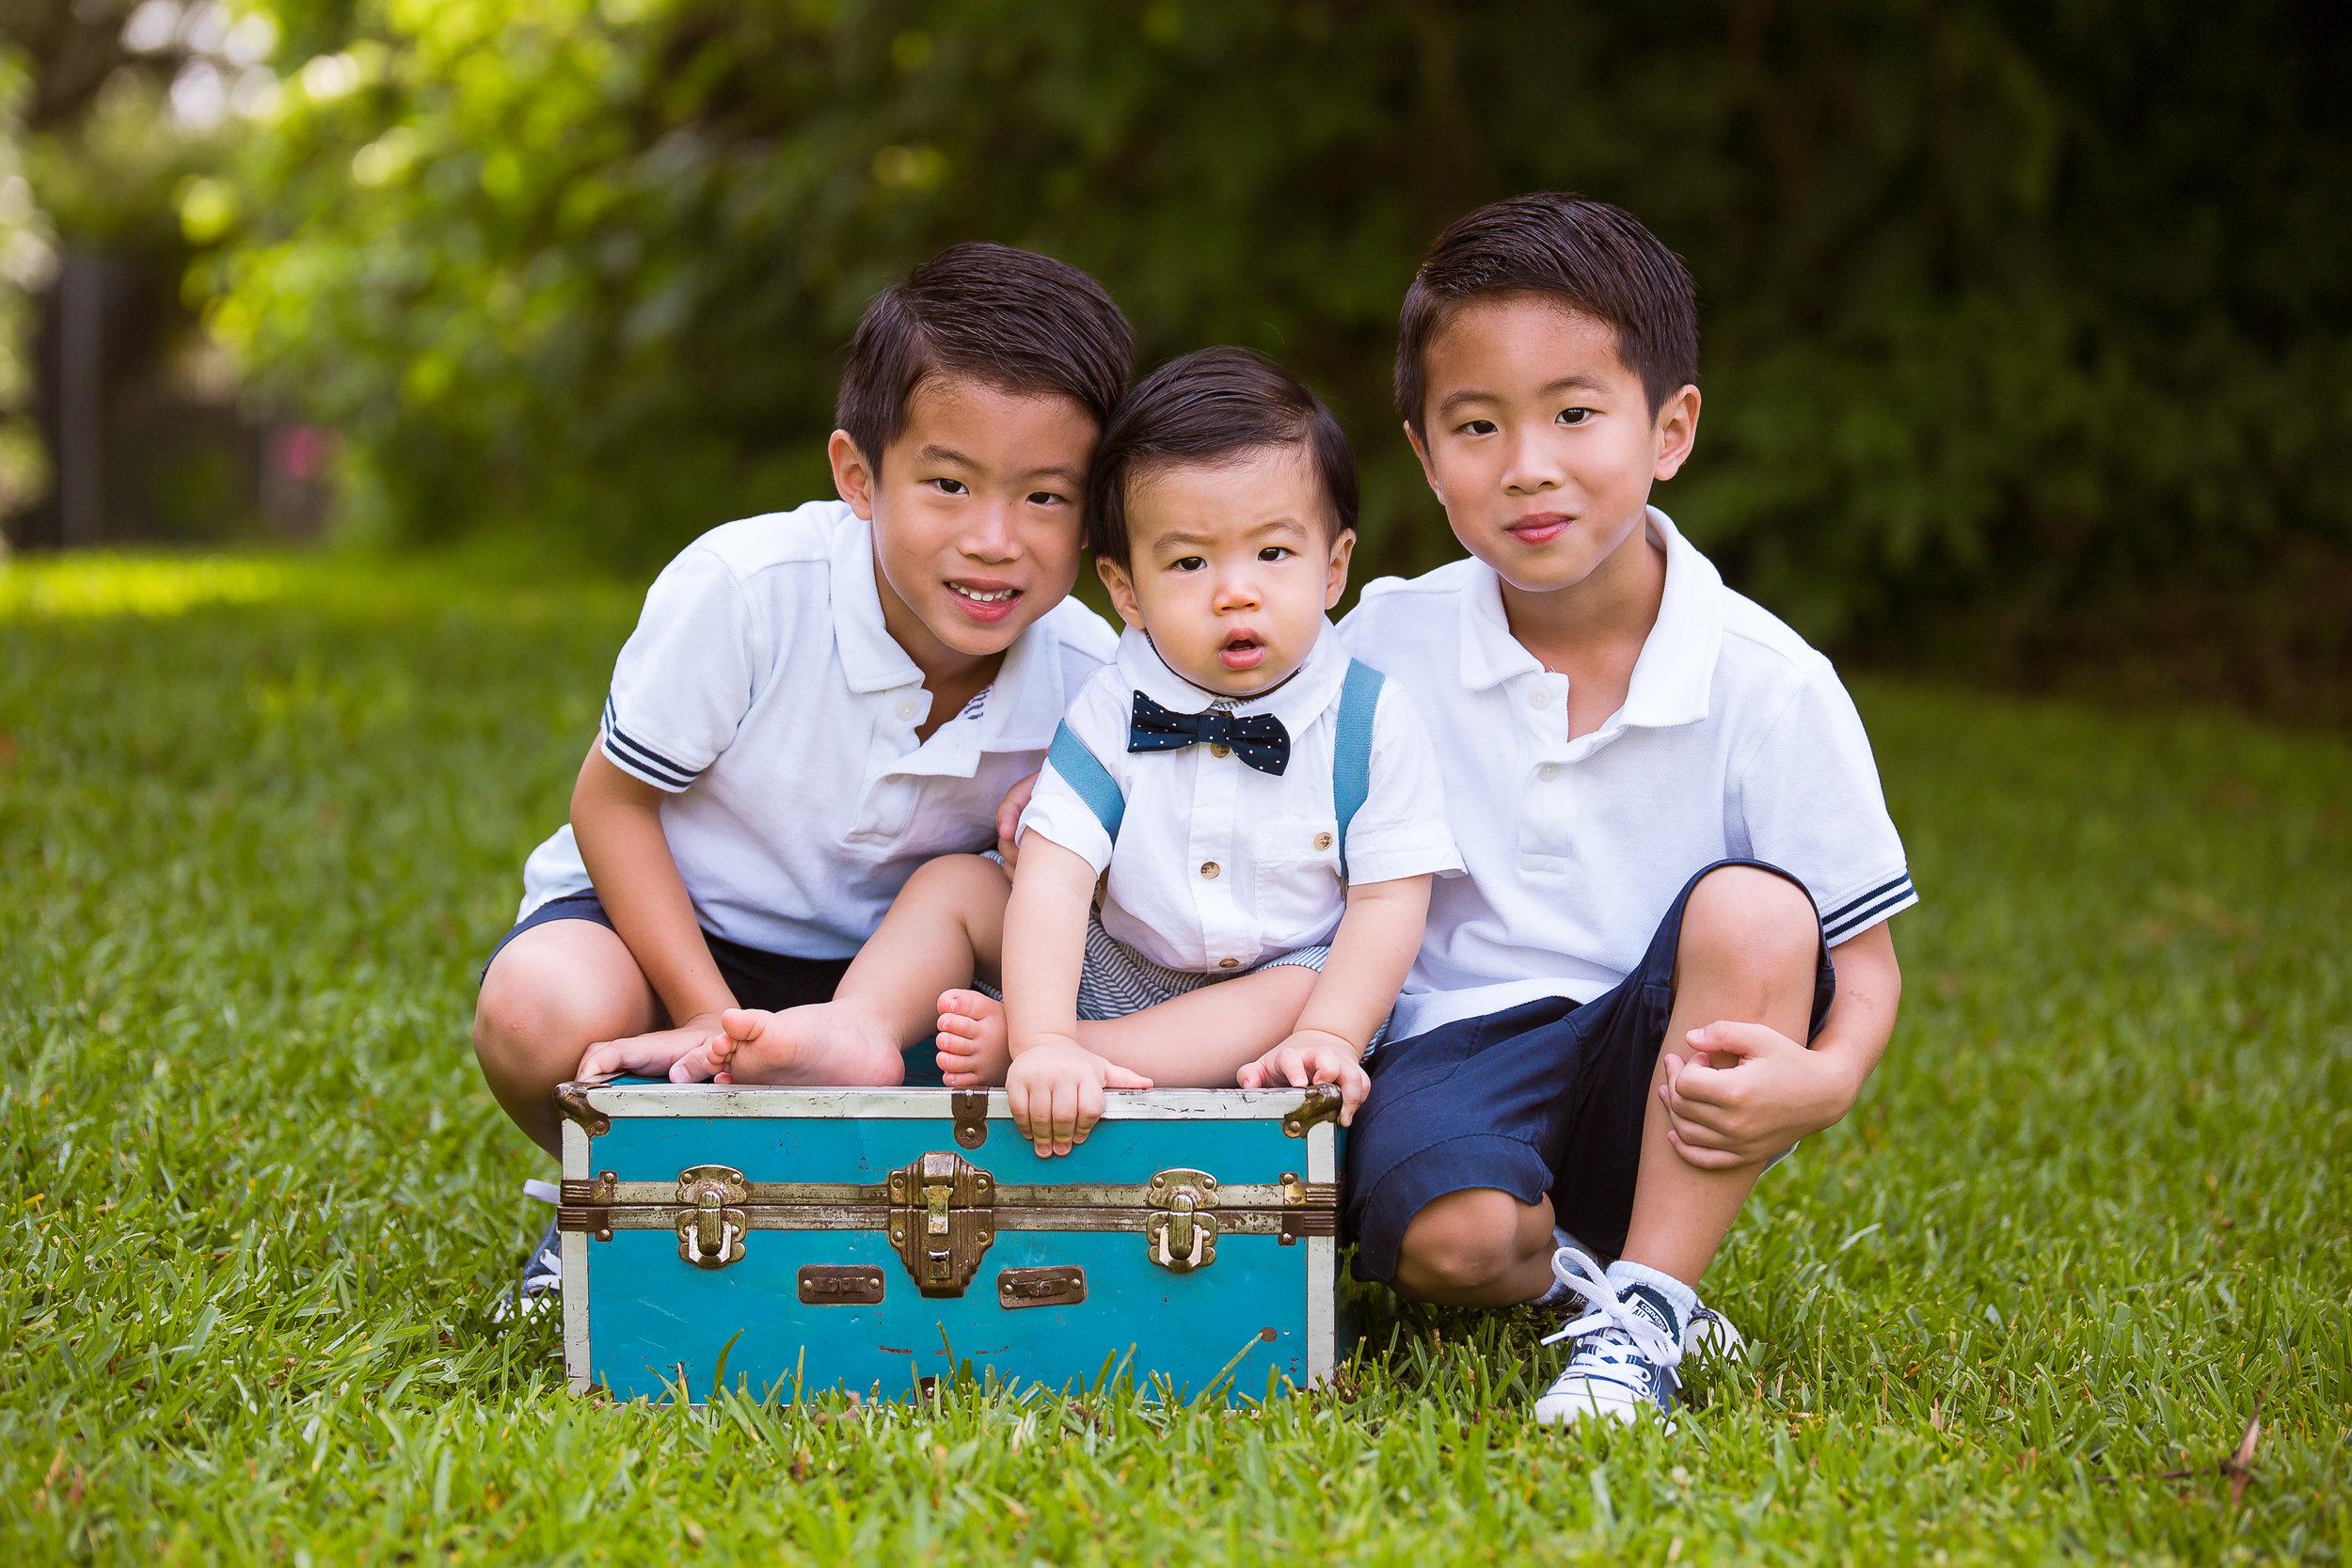 sugar-land-tx-katy-richmond-houston-kid-chidlren-photographer-outdoor-first-birthday-brother-photography.jpg